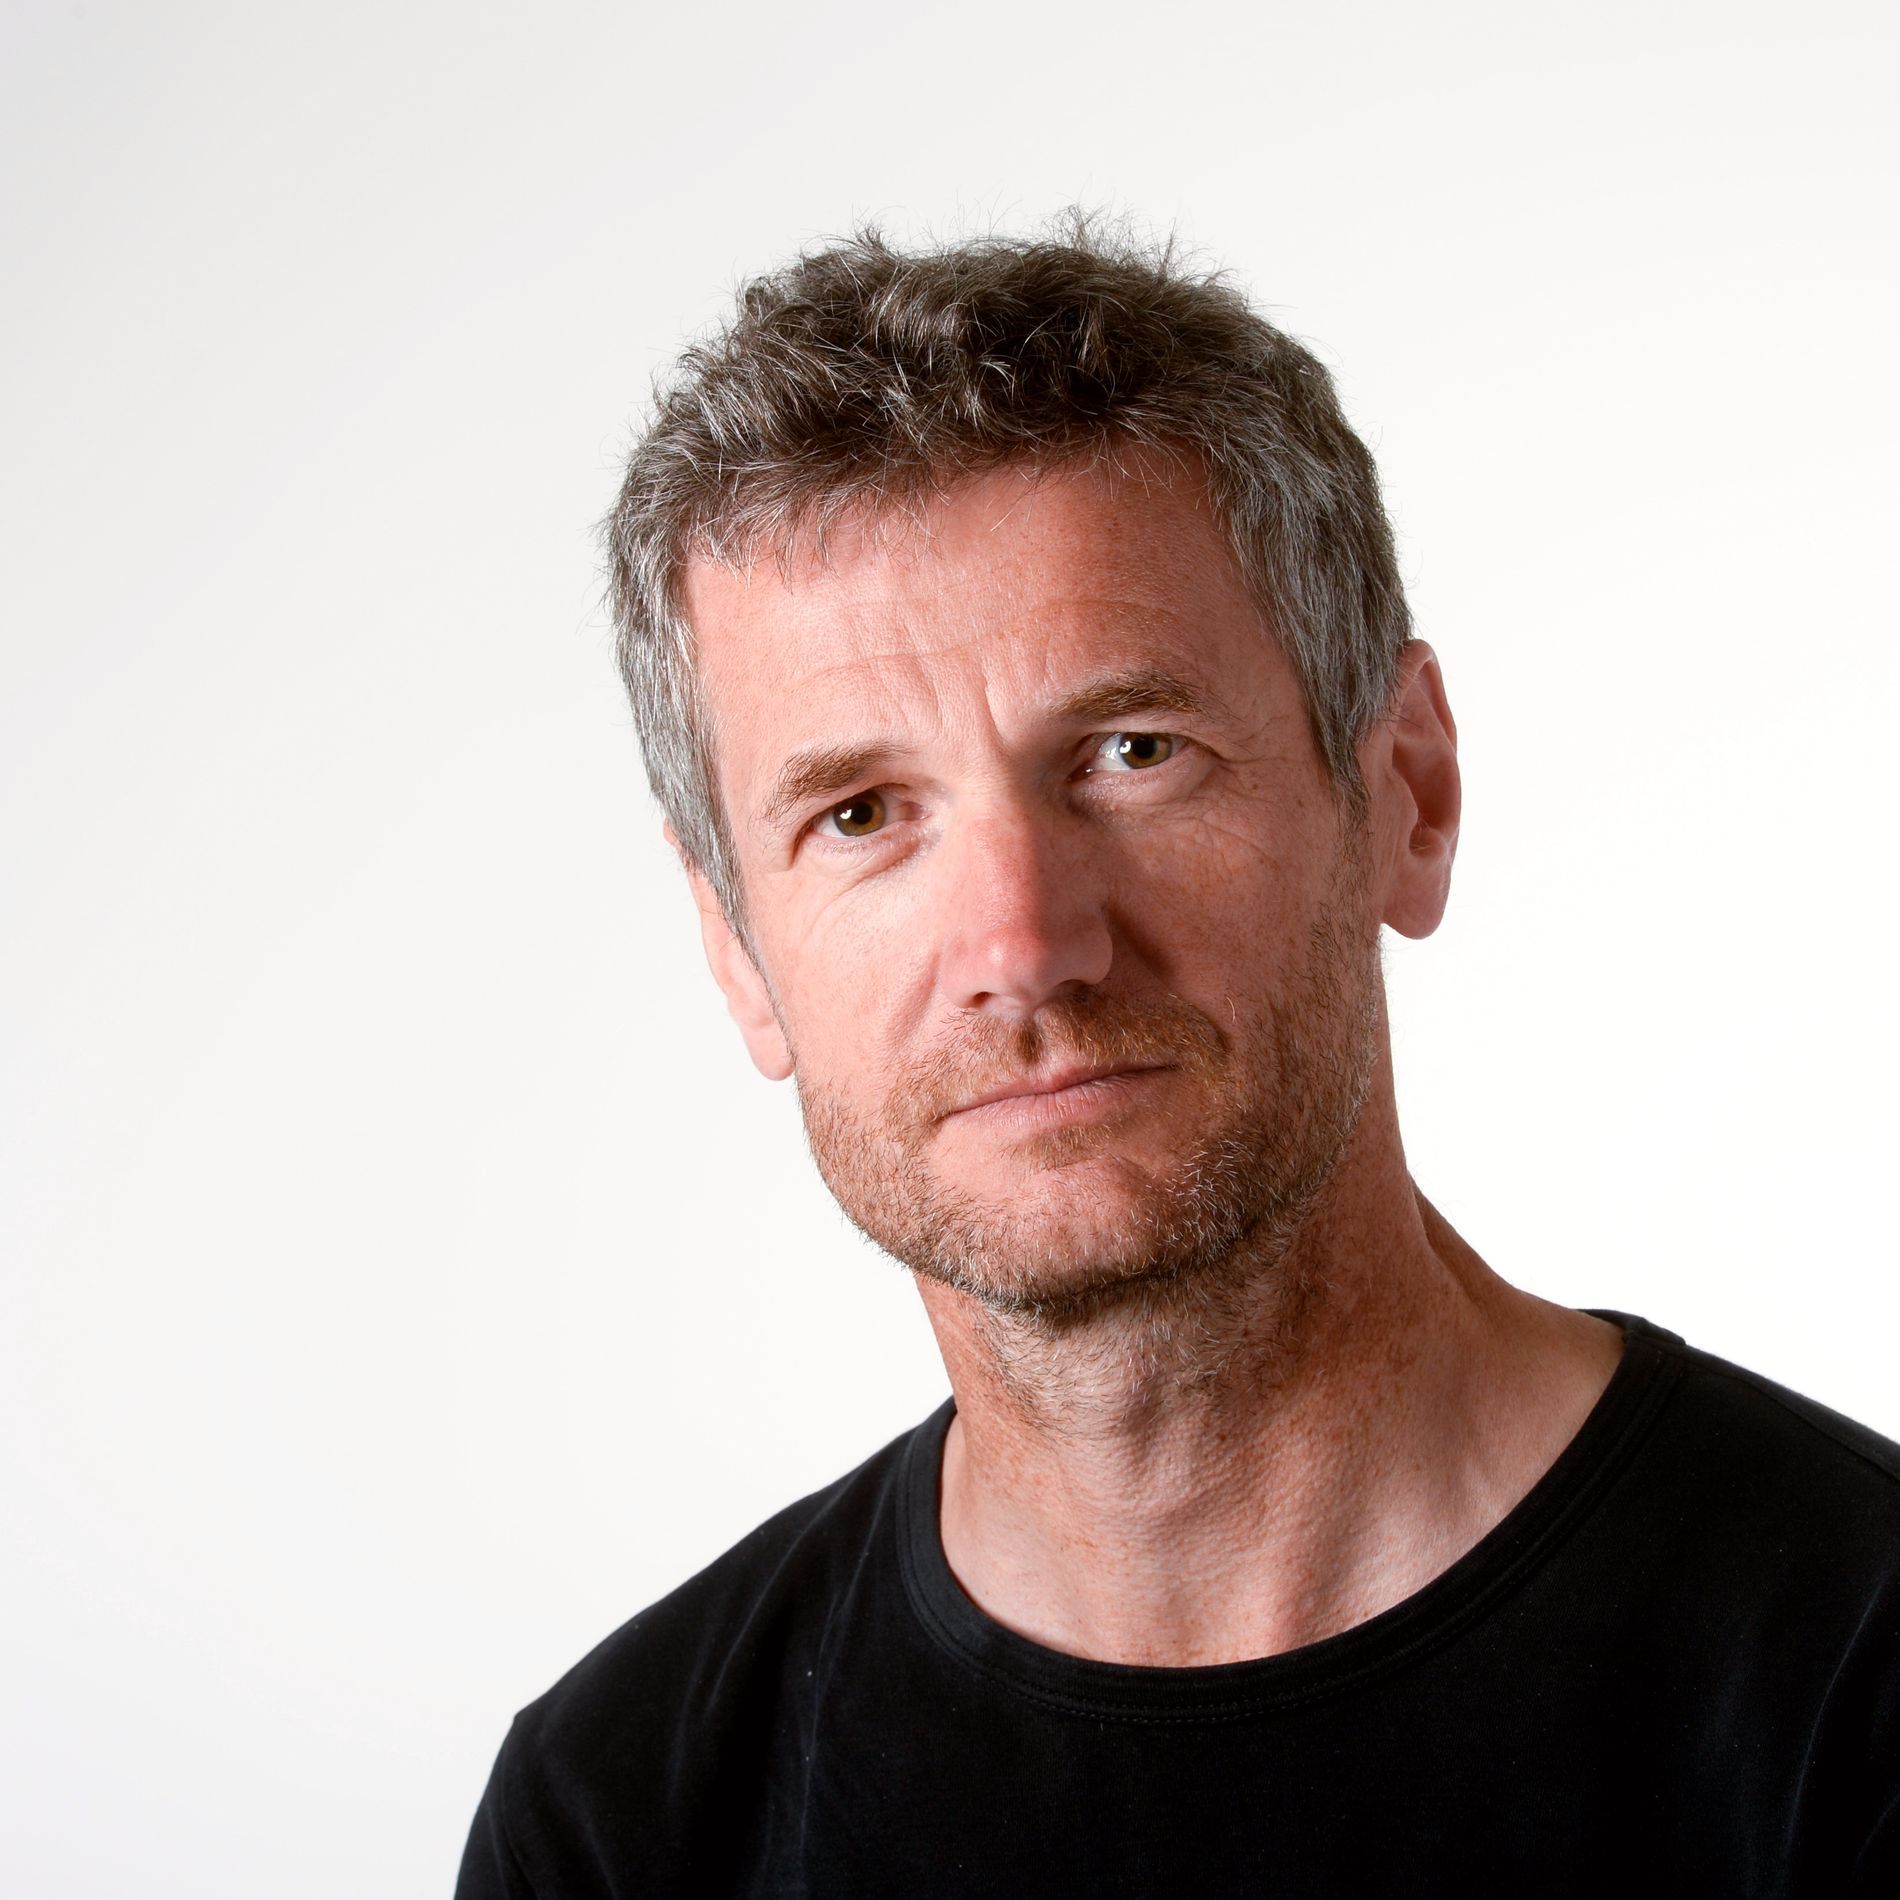 Fredrik Refvem